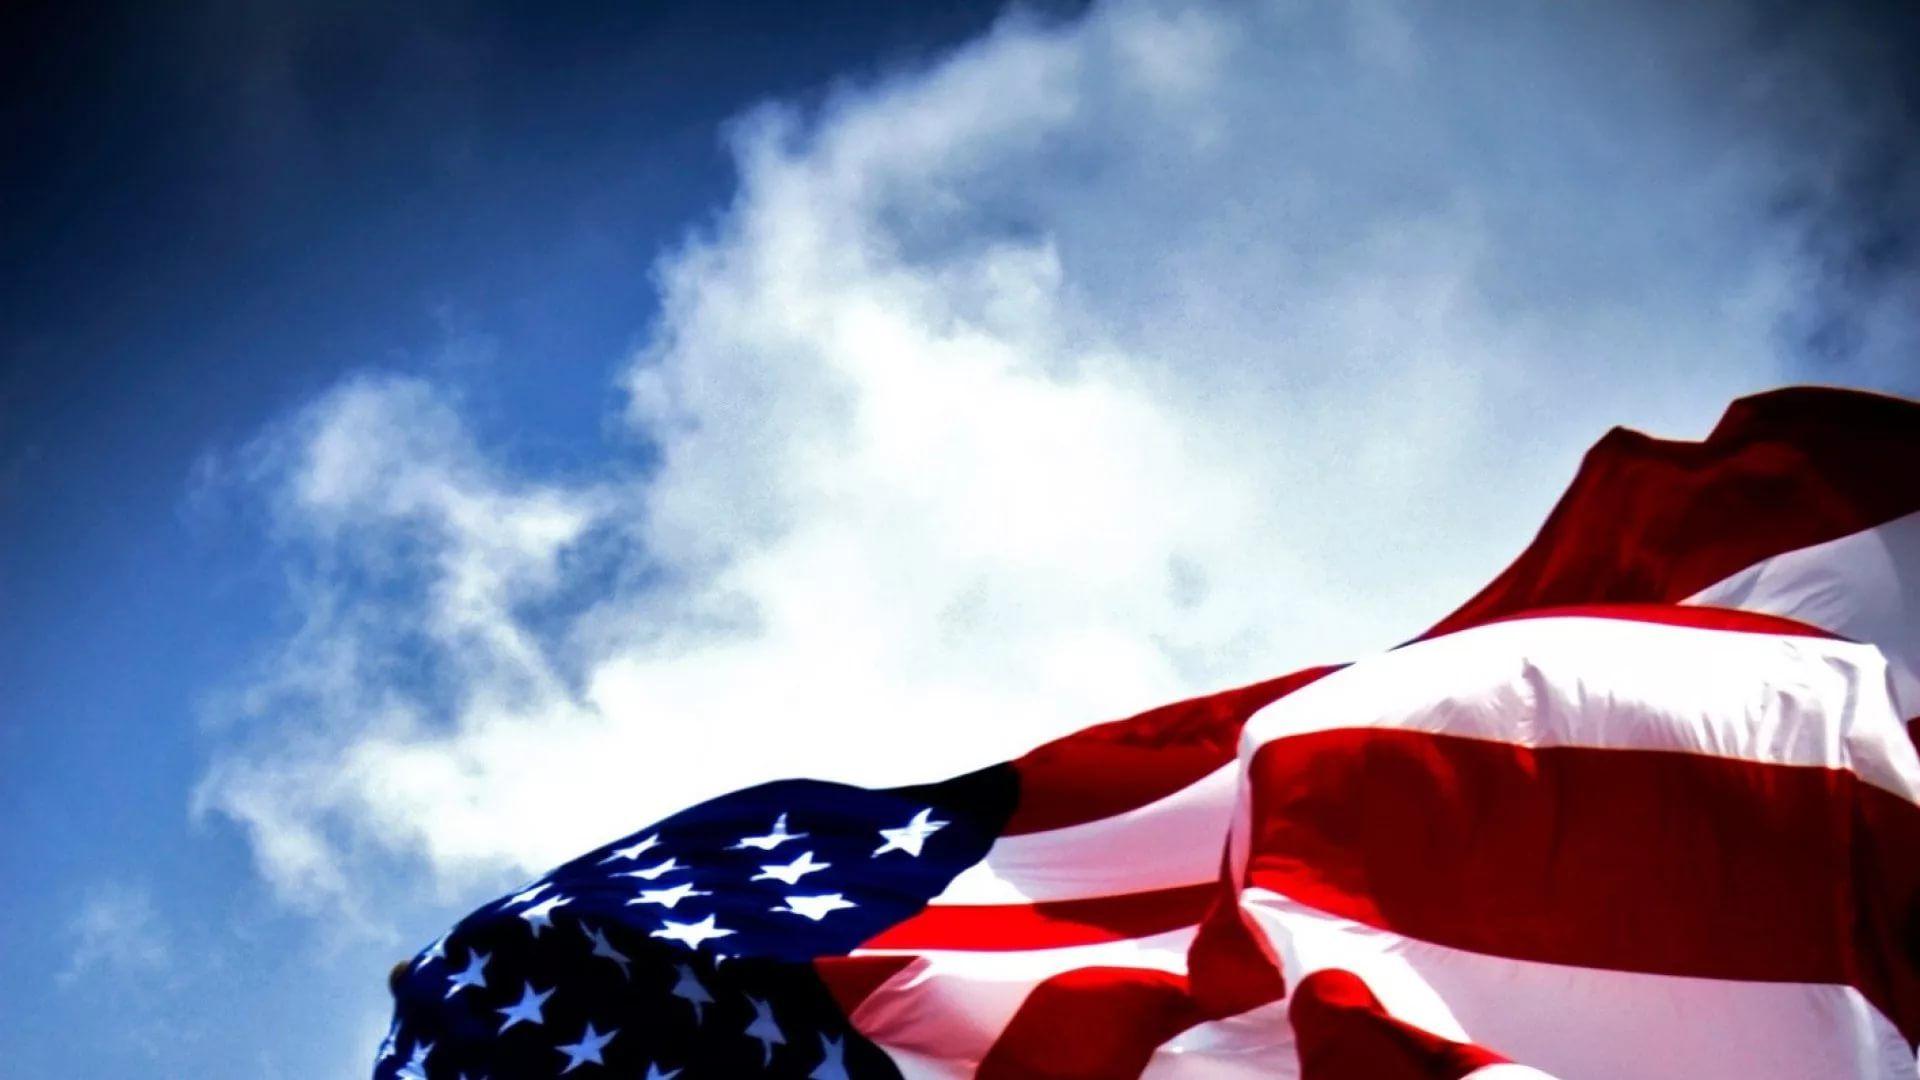 America Flag Wallpaper Image